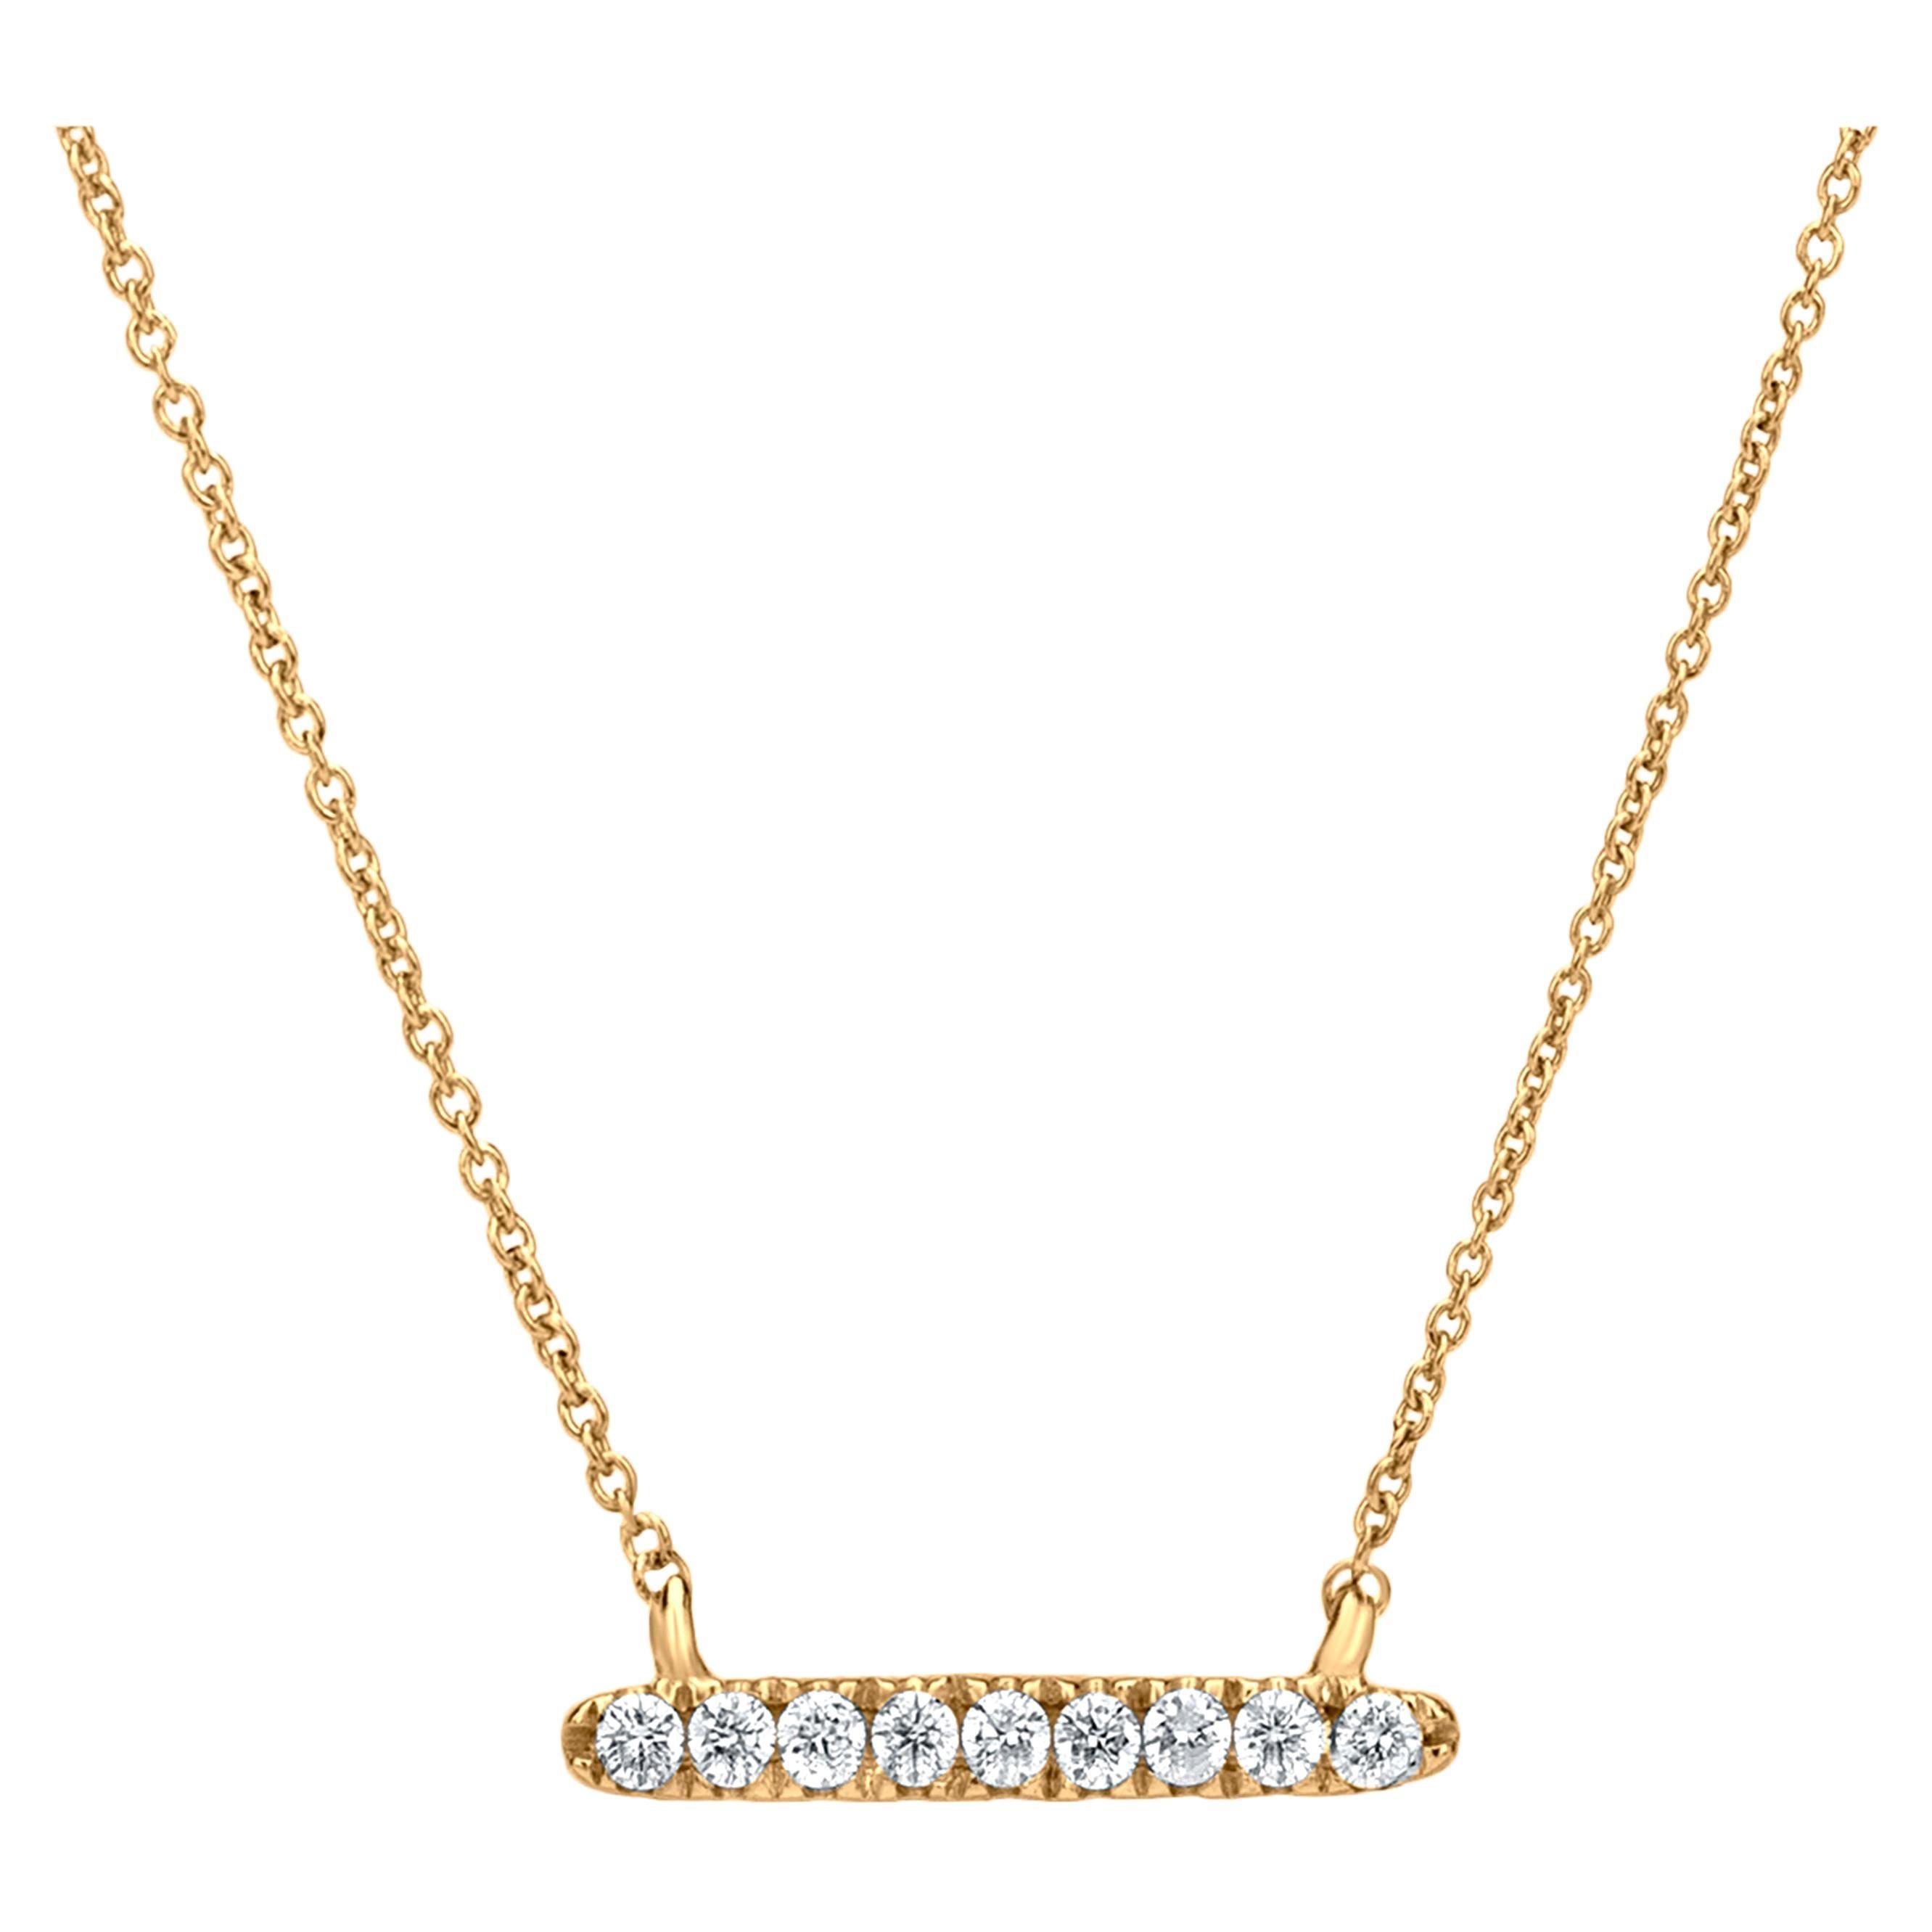 Diamond Bar Pendant Necklace in 18k Yellow Gold